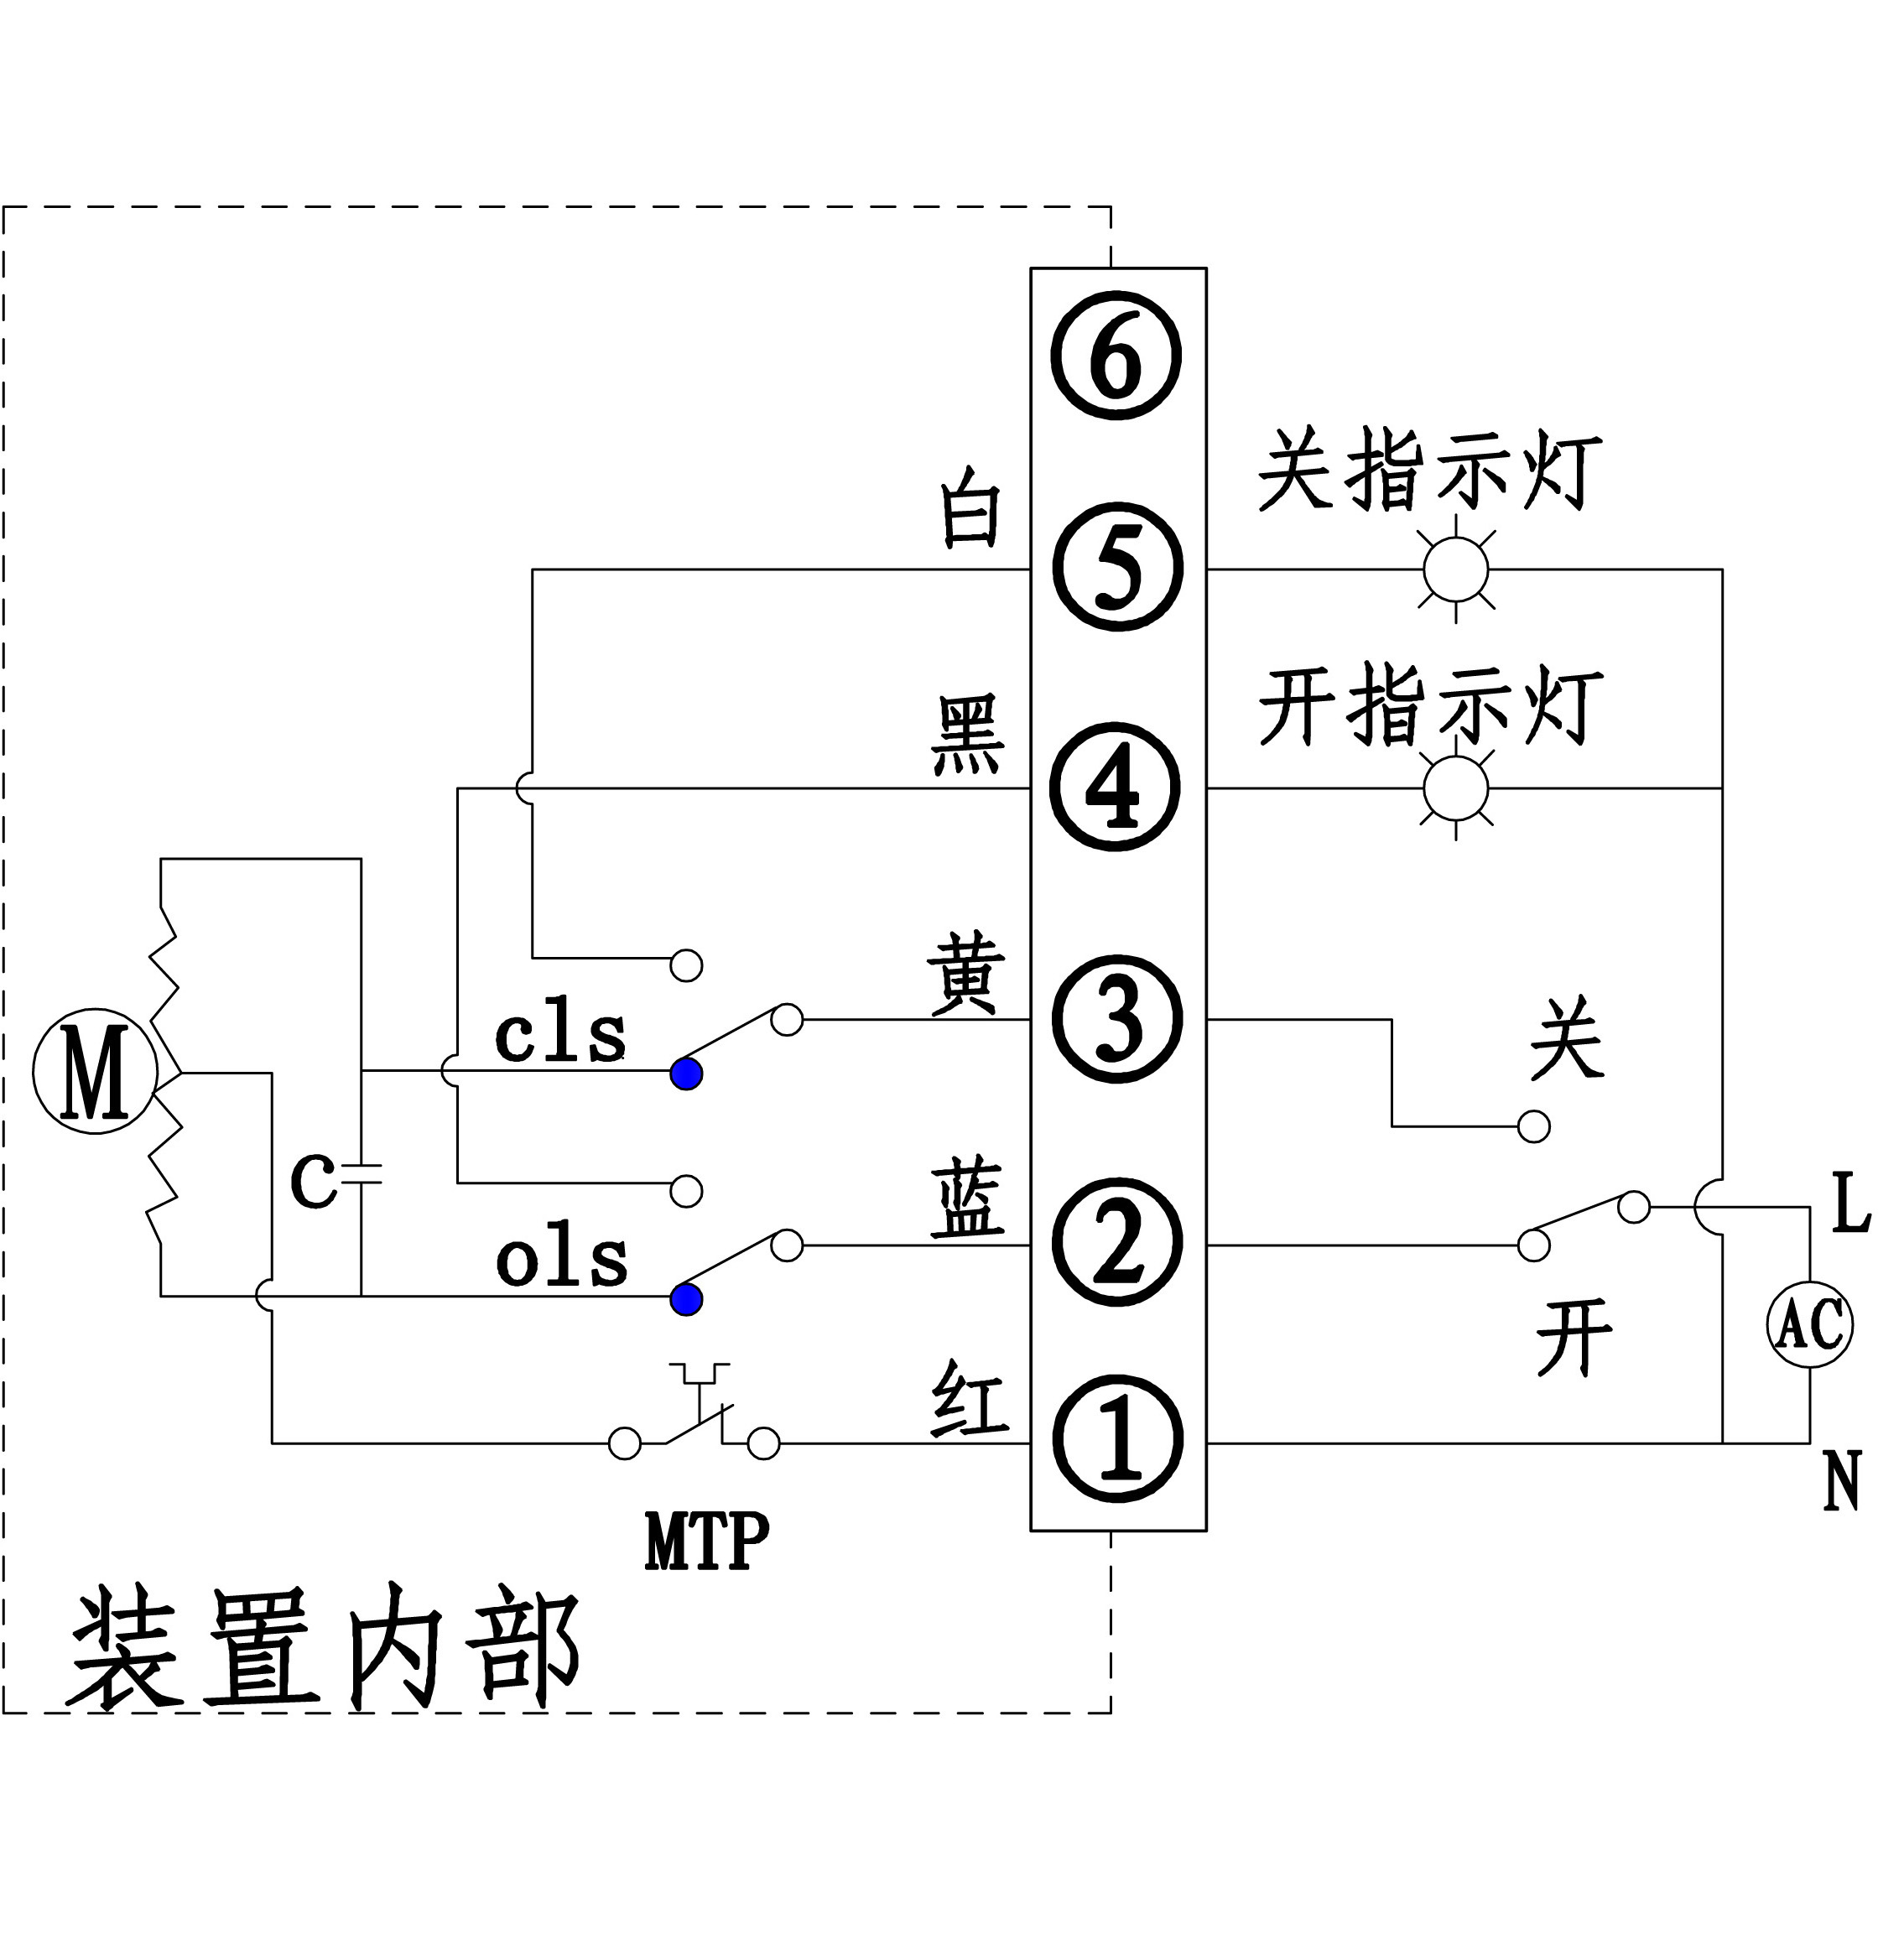 HL-10特点: 小型轻便,容易拆装及维修,并可在任意位置安装 结构简单、紧凑,90回转启闭迅速 操作扭矩小,省力轻巧 流量特性趋于直线,调节性能好 多种控制信号:开关控制; 比例(调节型)控制:0-10VDC或 4-20mA 反馈输出可选4-20mA、辅助开关及反馈电位器(0~1K) 电源电压:AC110V、AC220V、AC380V、AC415V、AC24V 、DC24V 启闭次数多达数万次,寿命长 达到完全密封,泄漏为零 IP67高标准防护等级,室内室外无所不能 HL-10补充说明: HL防水型阀门